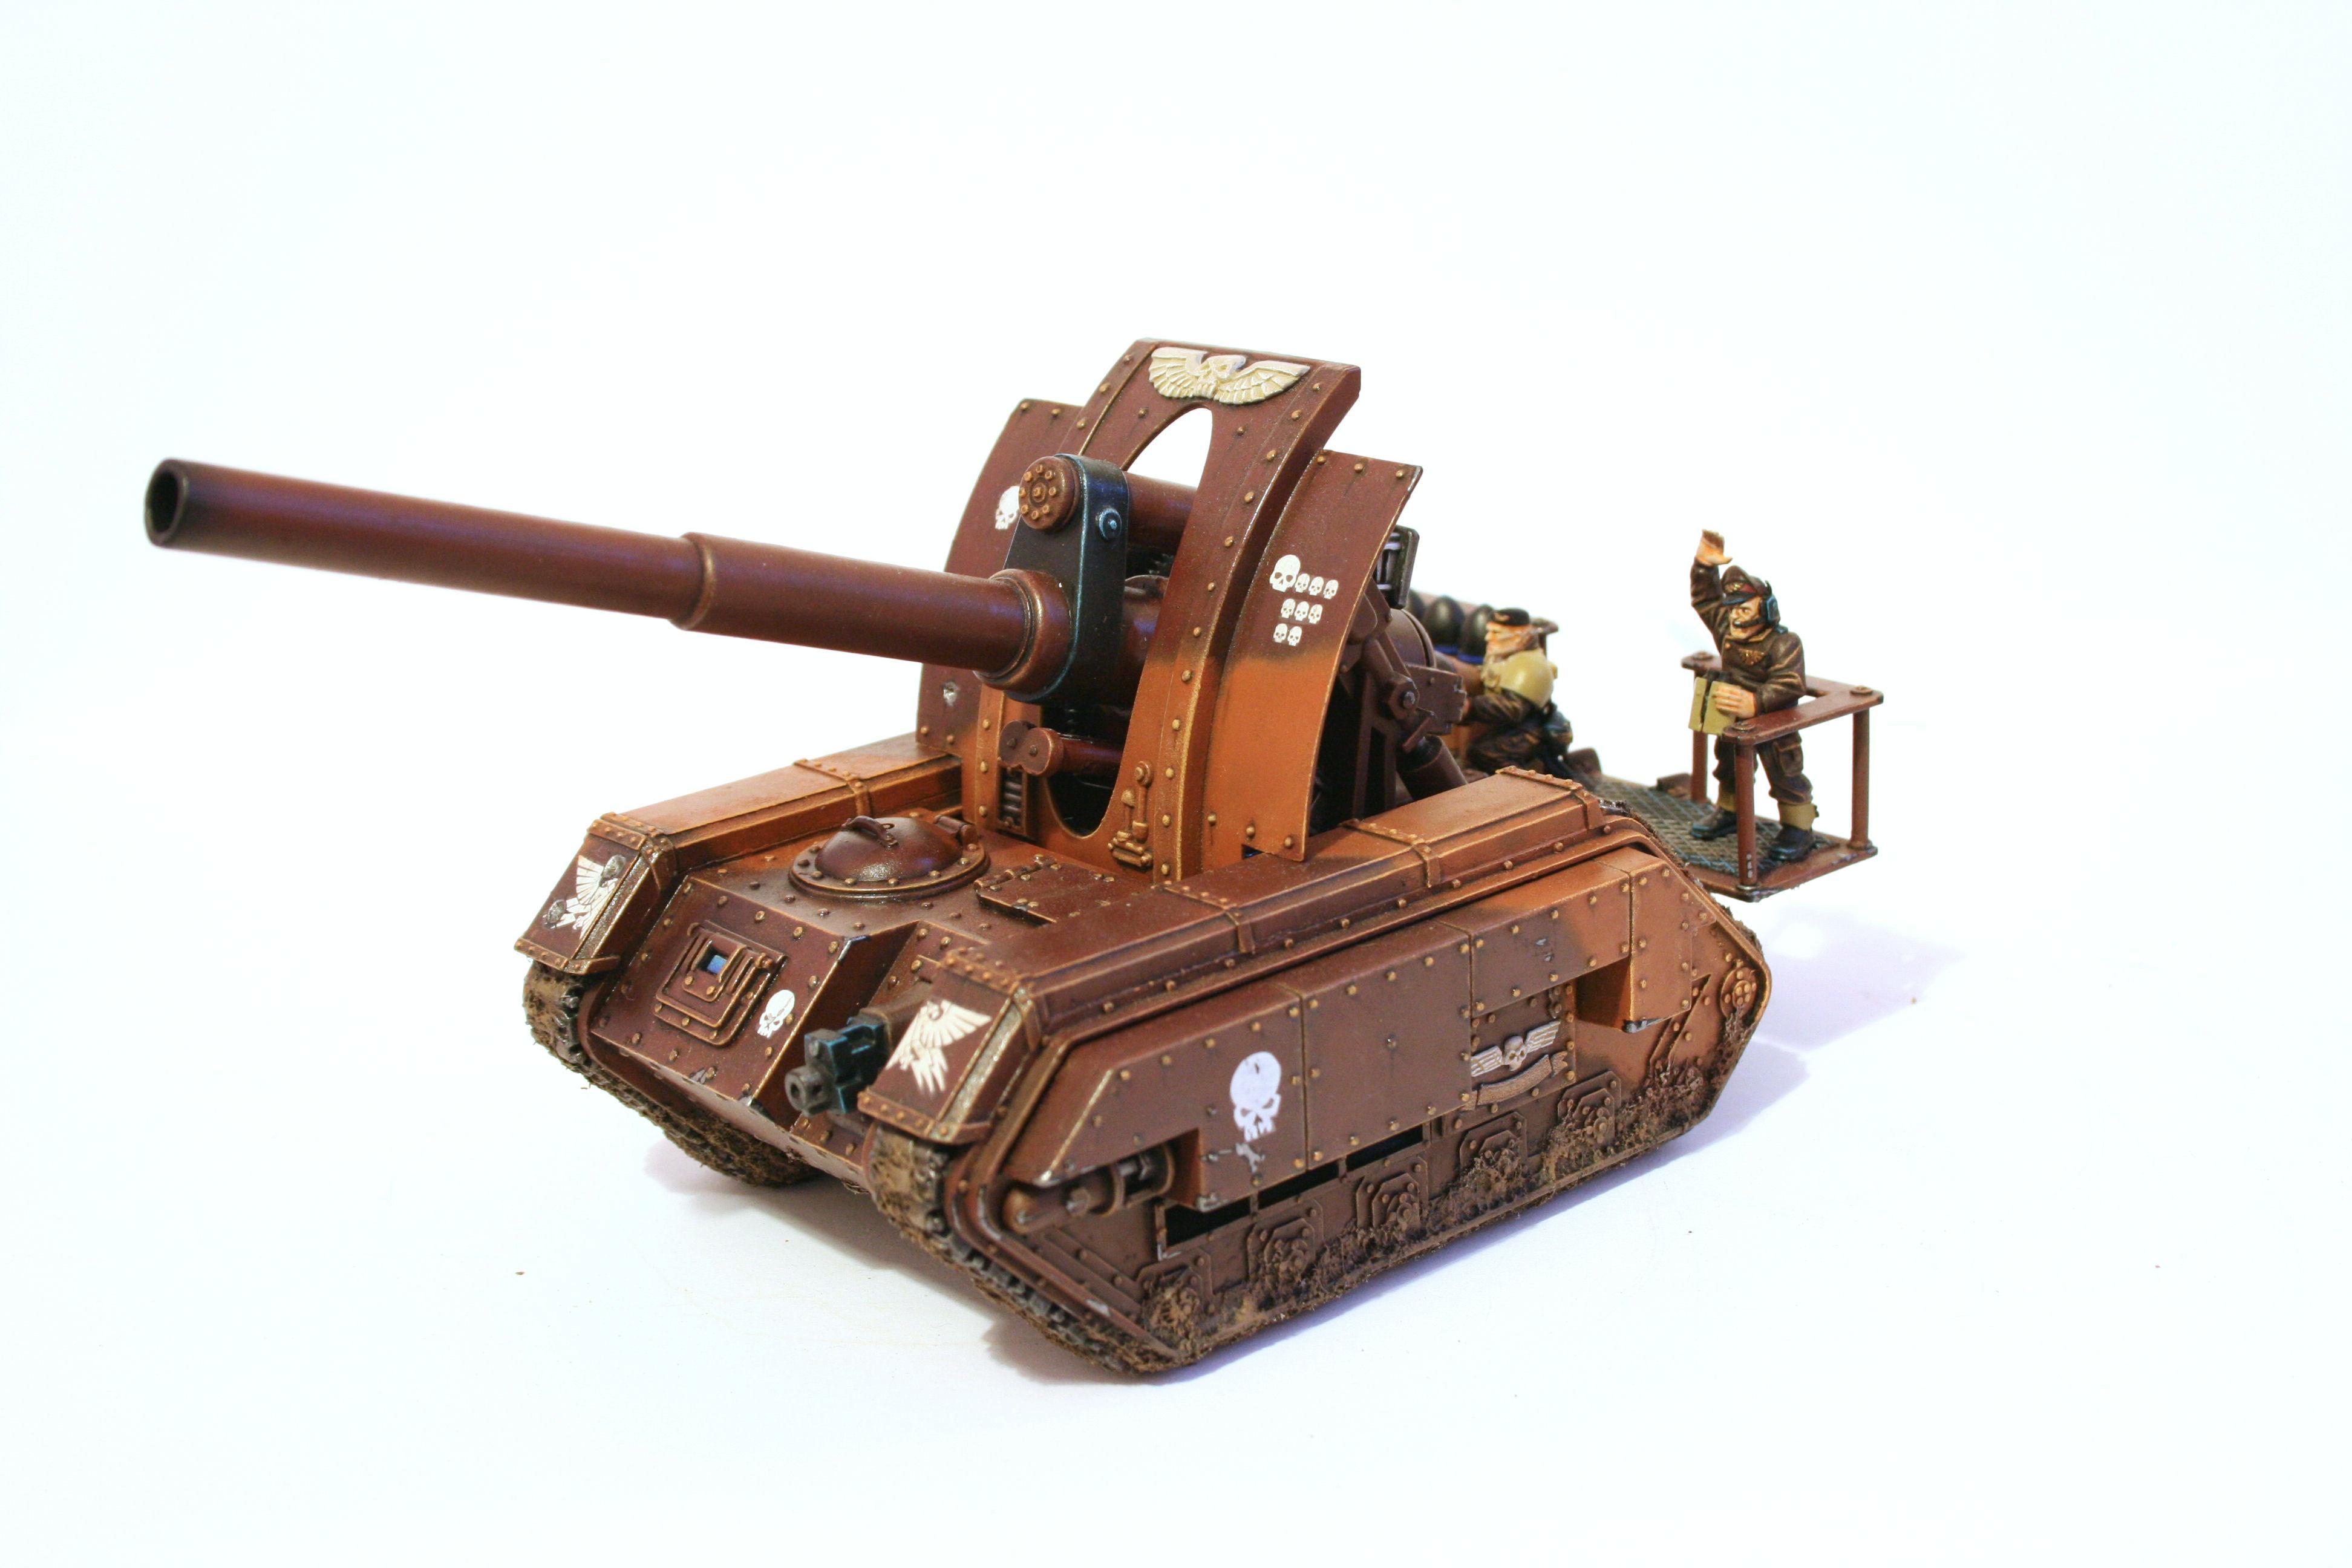 Artillery, Basilisk, Heavy Support, Imperial Guard